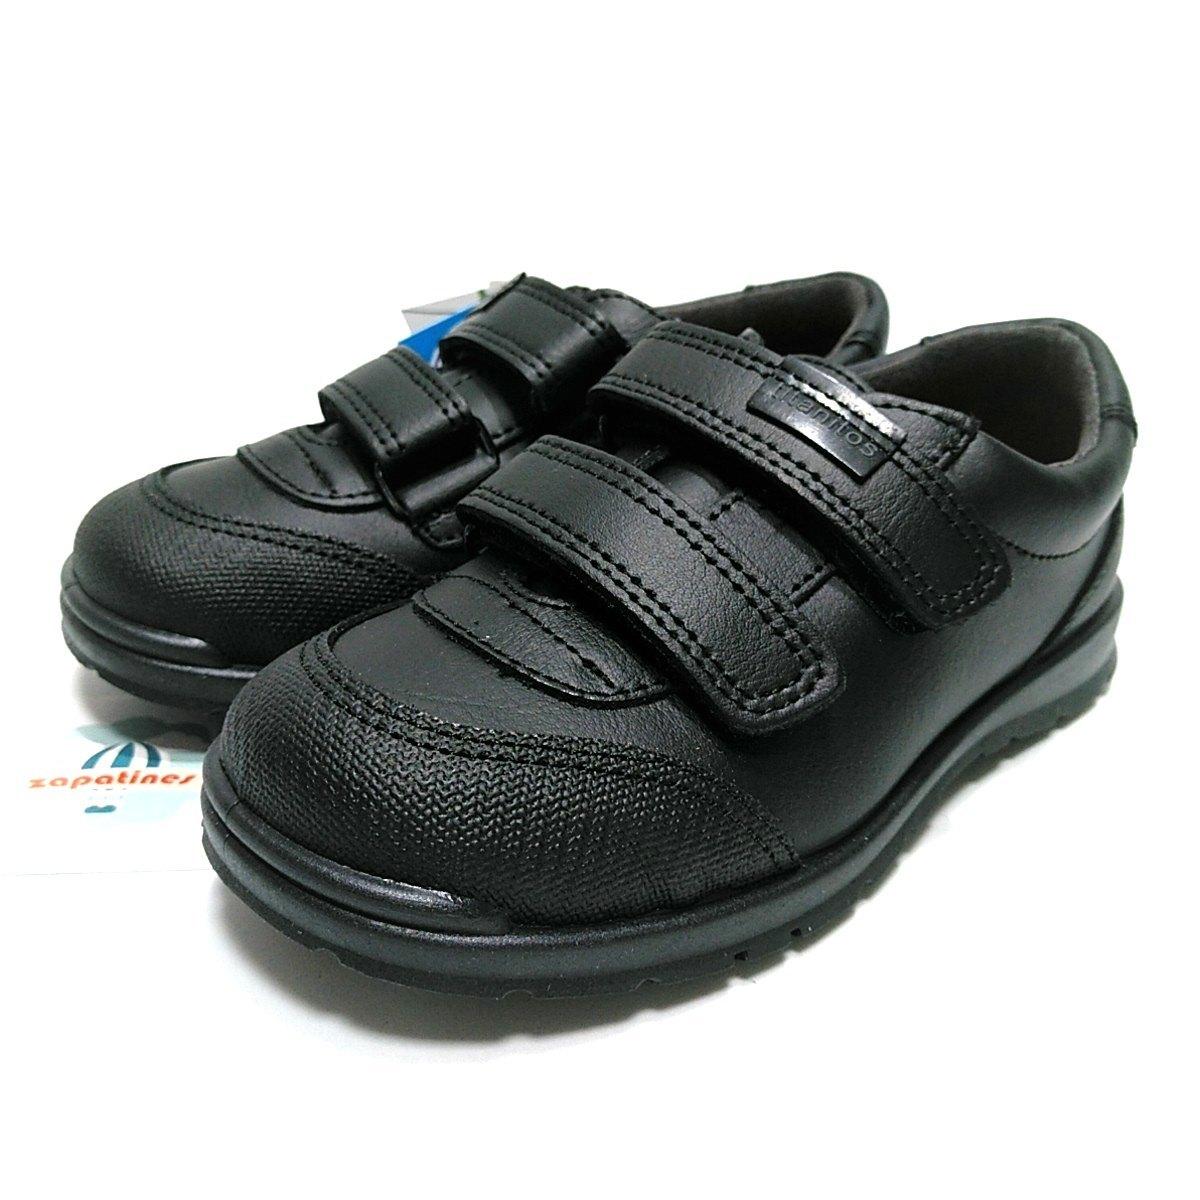 703bd1bb1 Titanitos Colegial Negro Velcros para niño con puntera reforzada ...